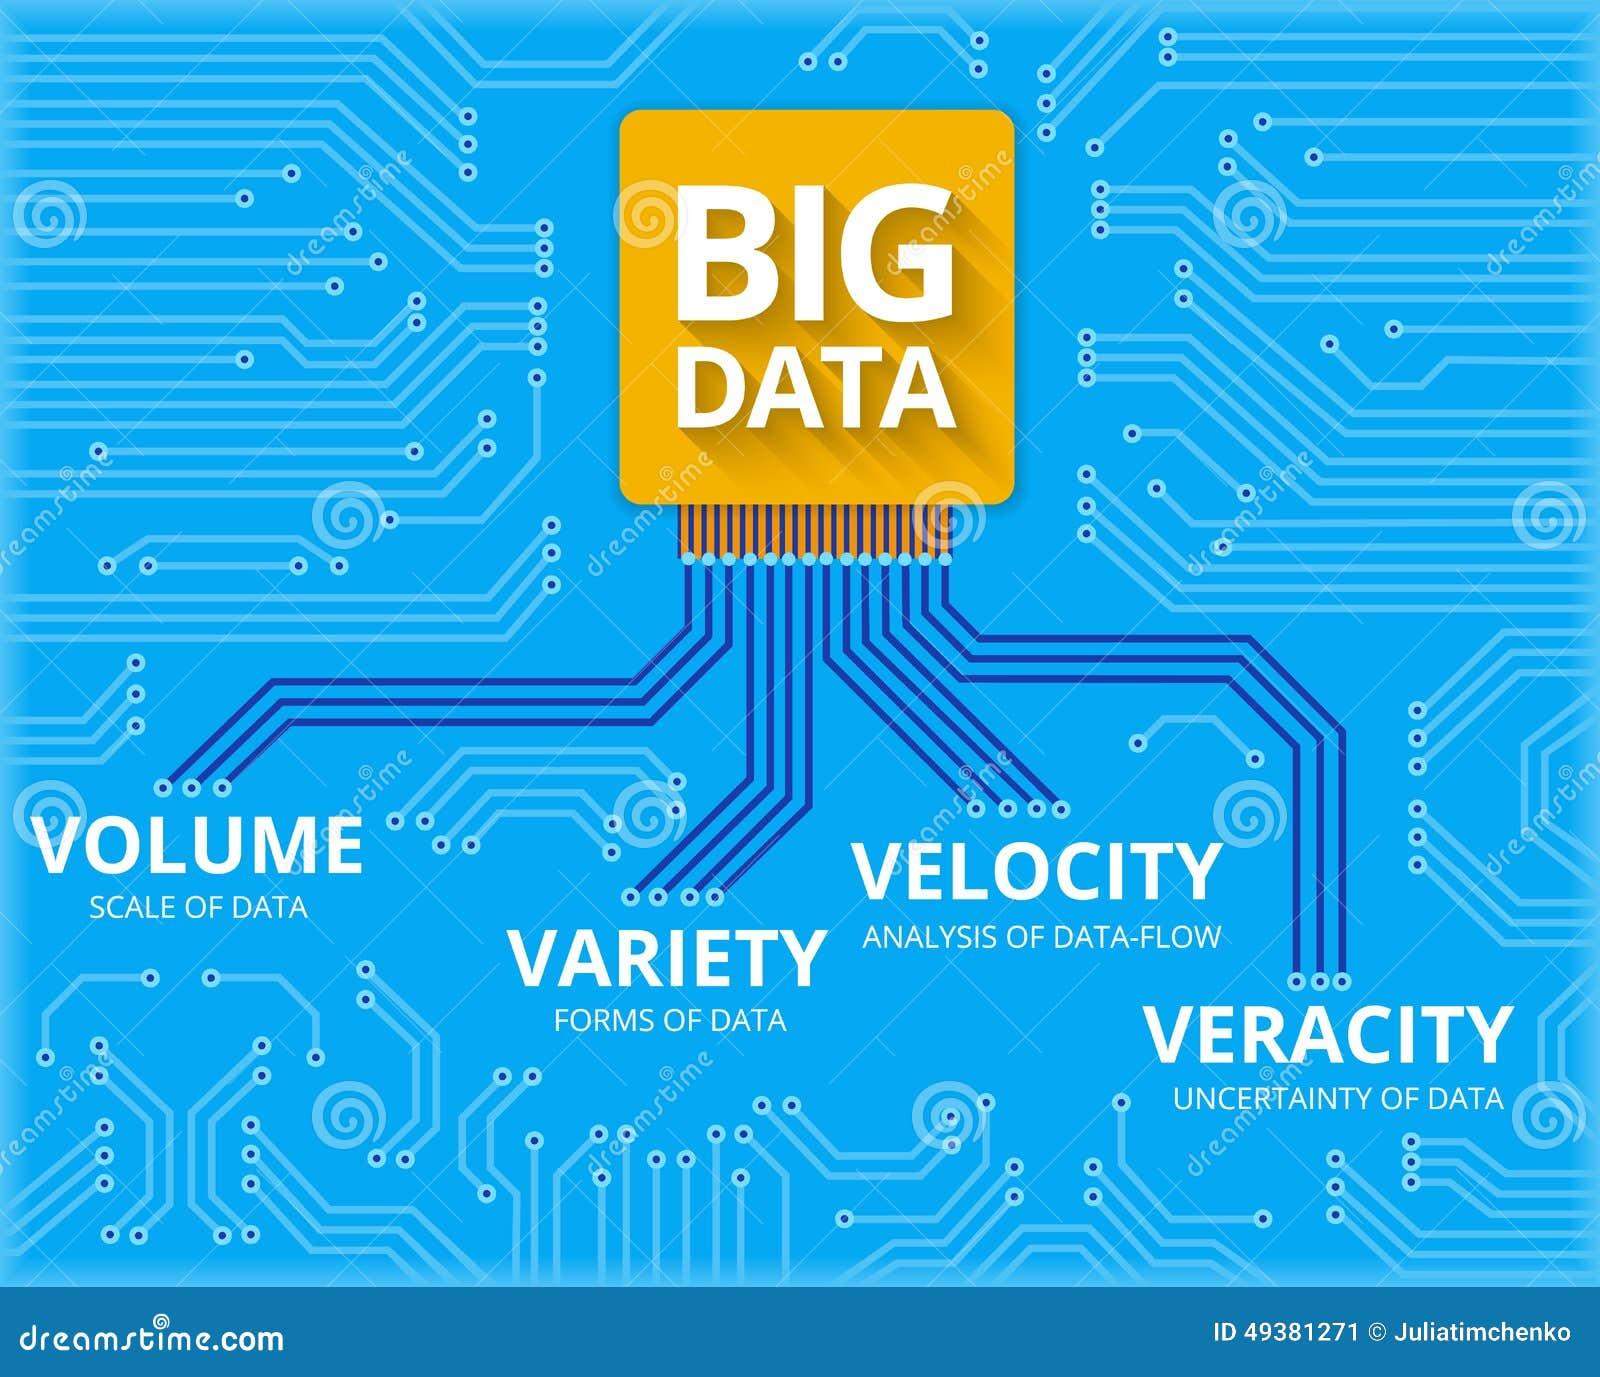 Big Data 4v Visualisation Stock Vector Image 49381271